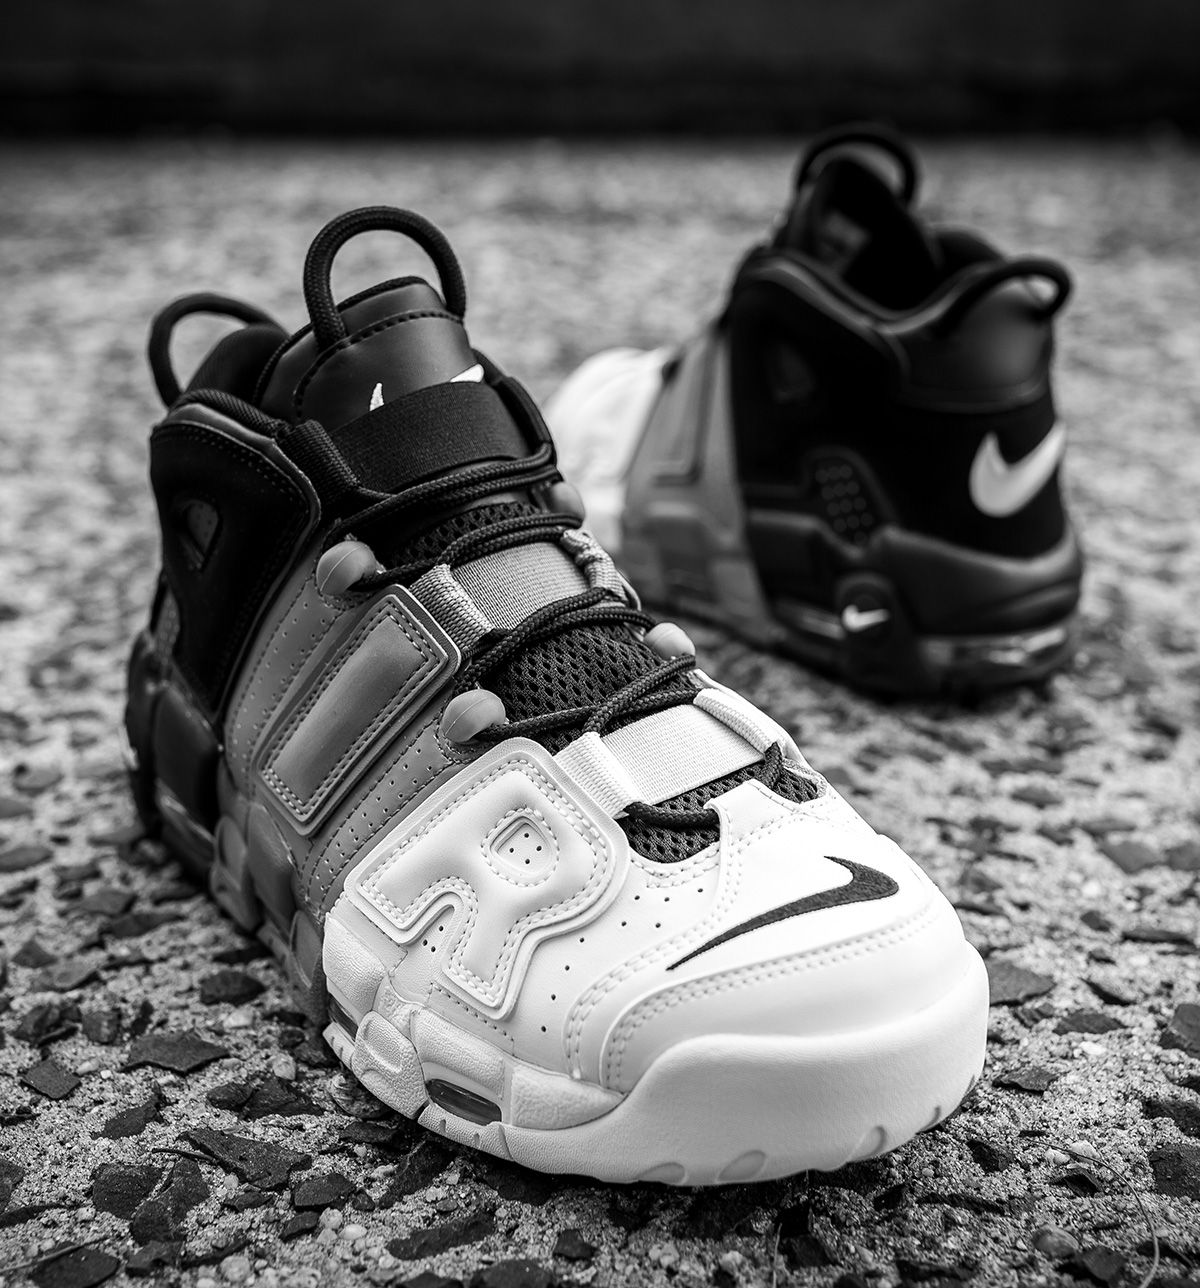 59aa85f788a86 Nike Air More Uptempo  Tricolor  Detailed Pics - EU Kicks  Sneaker Magazine